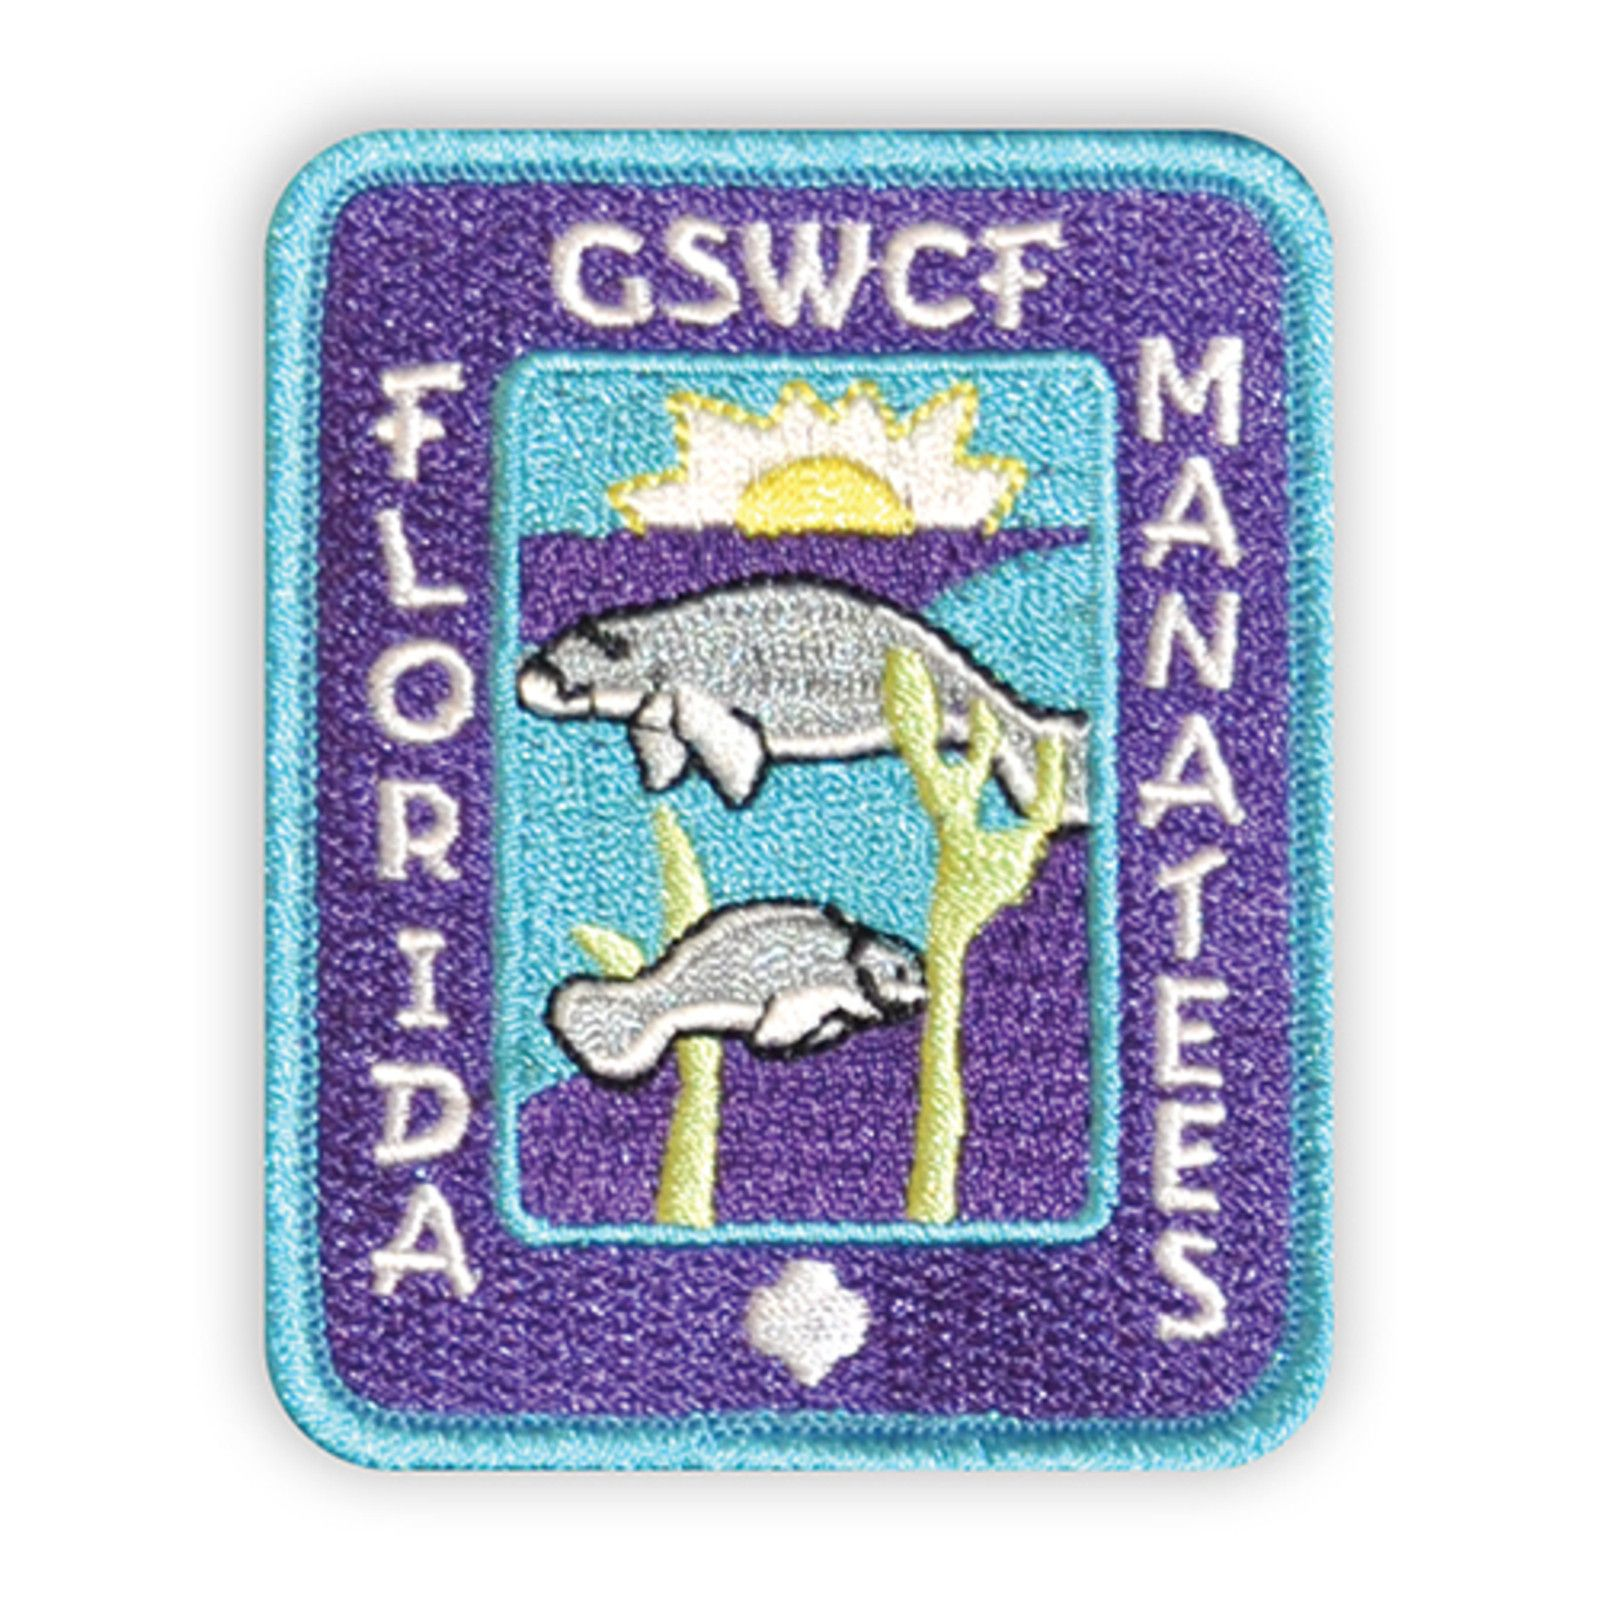 Gswcf Florida Manatee Fun Patch